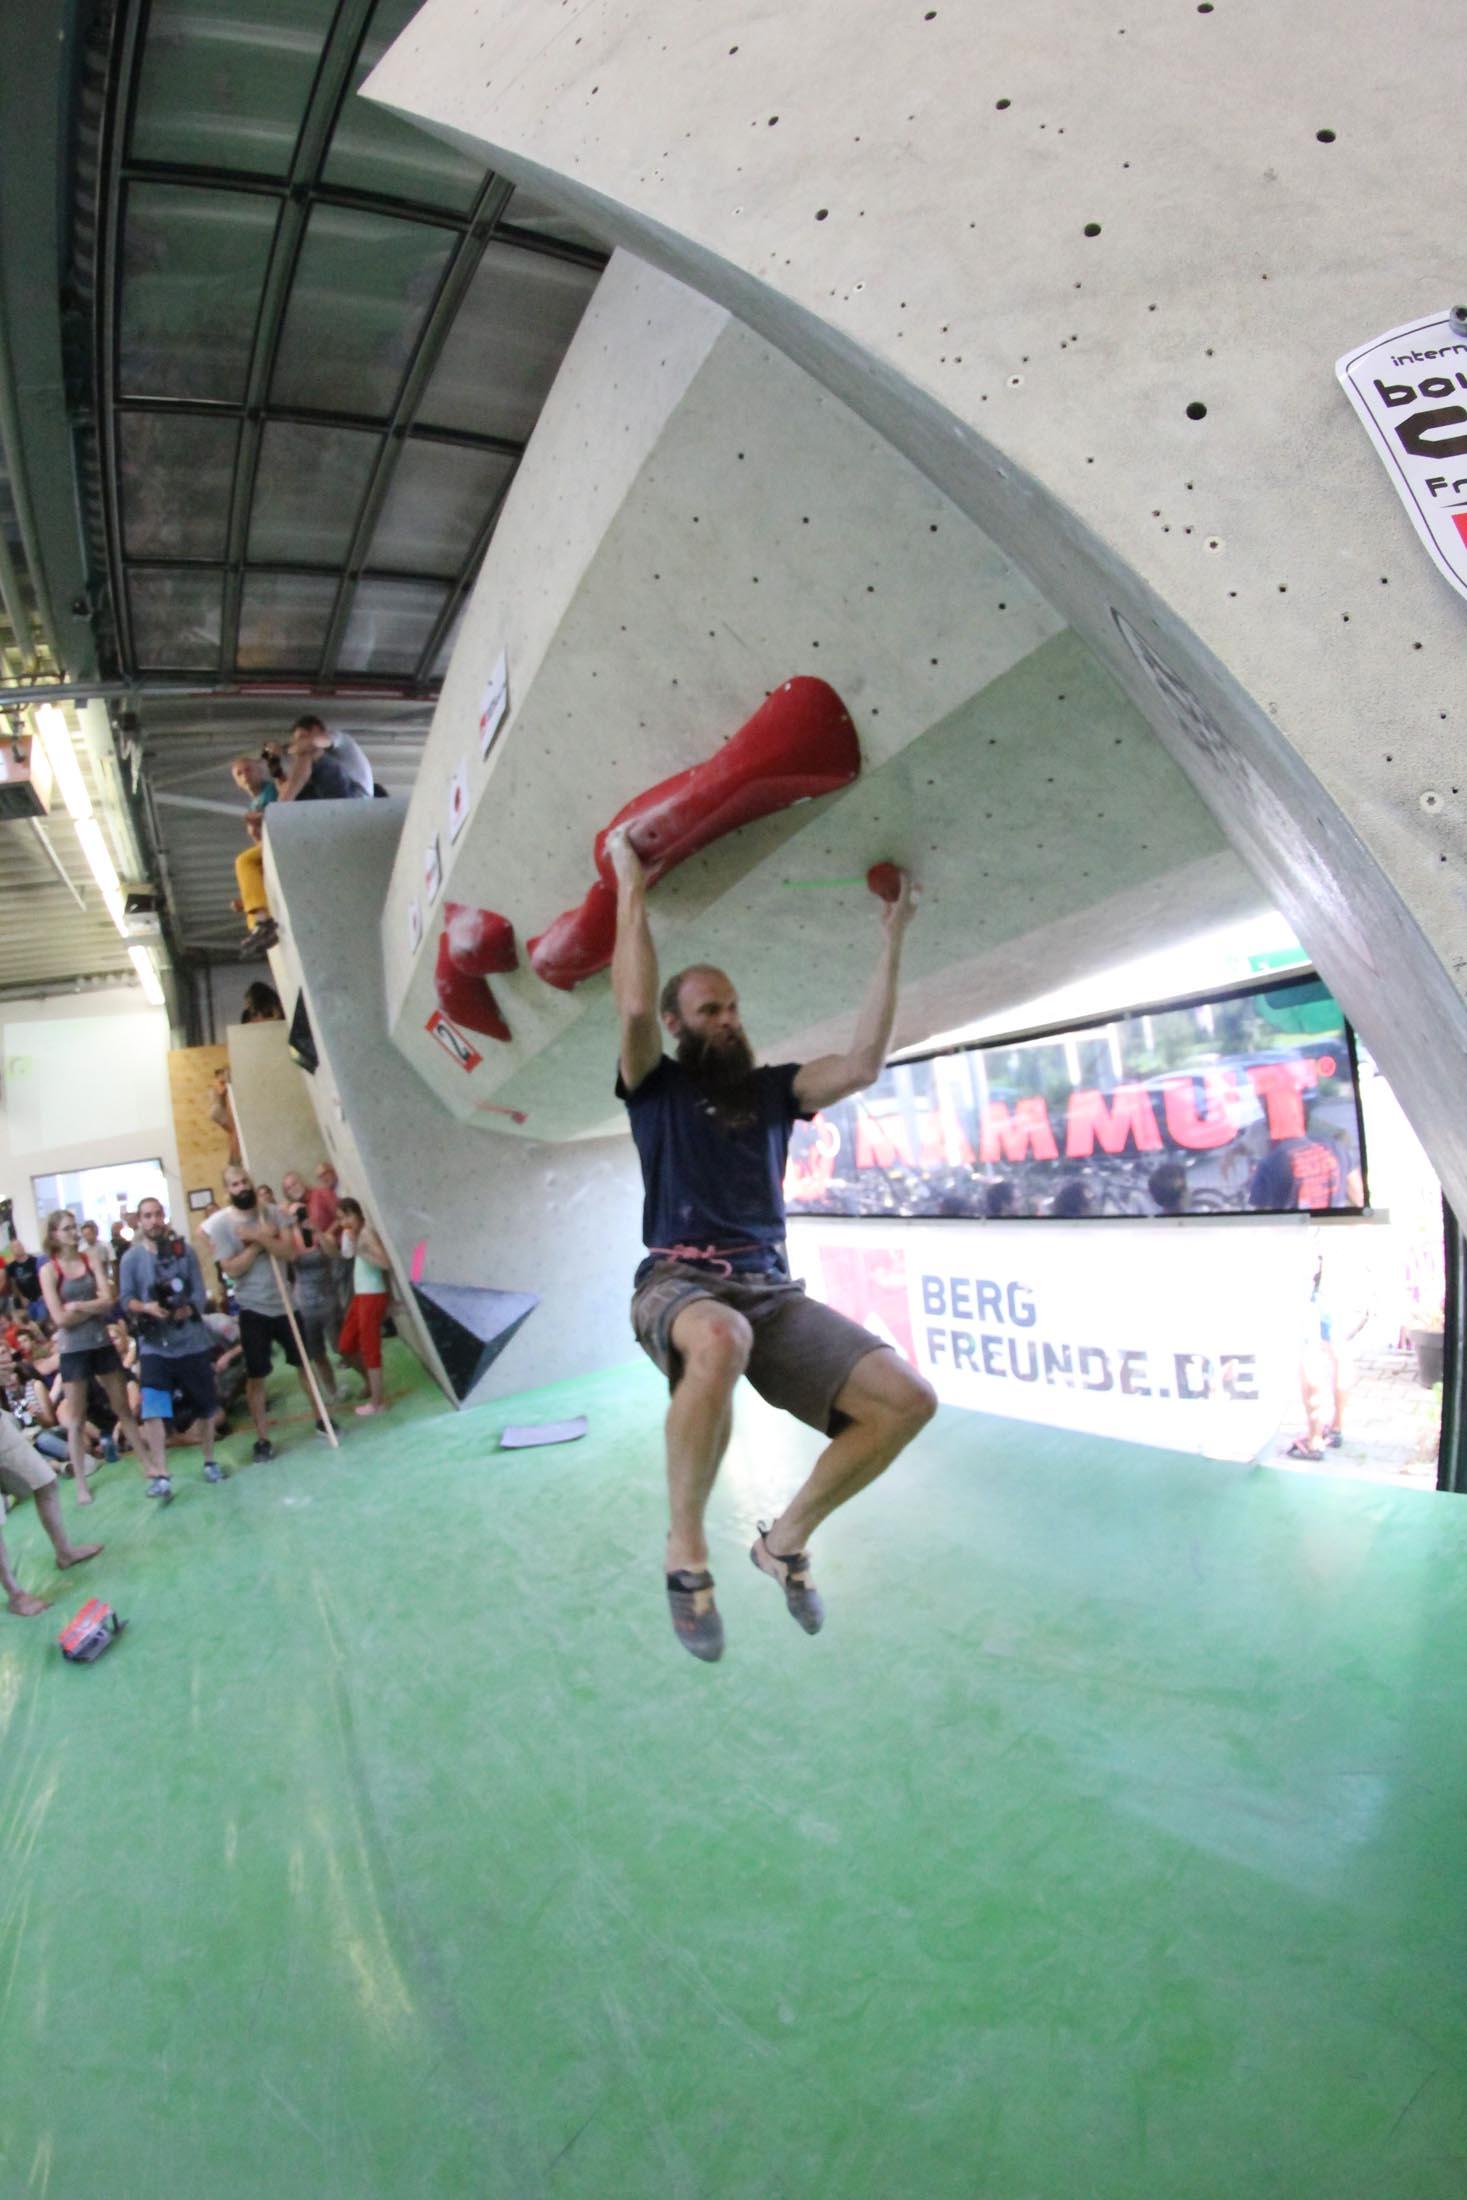 Finale, internationaler bouldercup Frankenjura 2016, BLOCKHELDEN Erlangen, Mammut, Bergfreunde.de, Boulderwettkampf07092016594